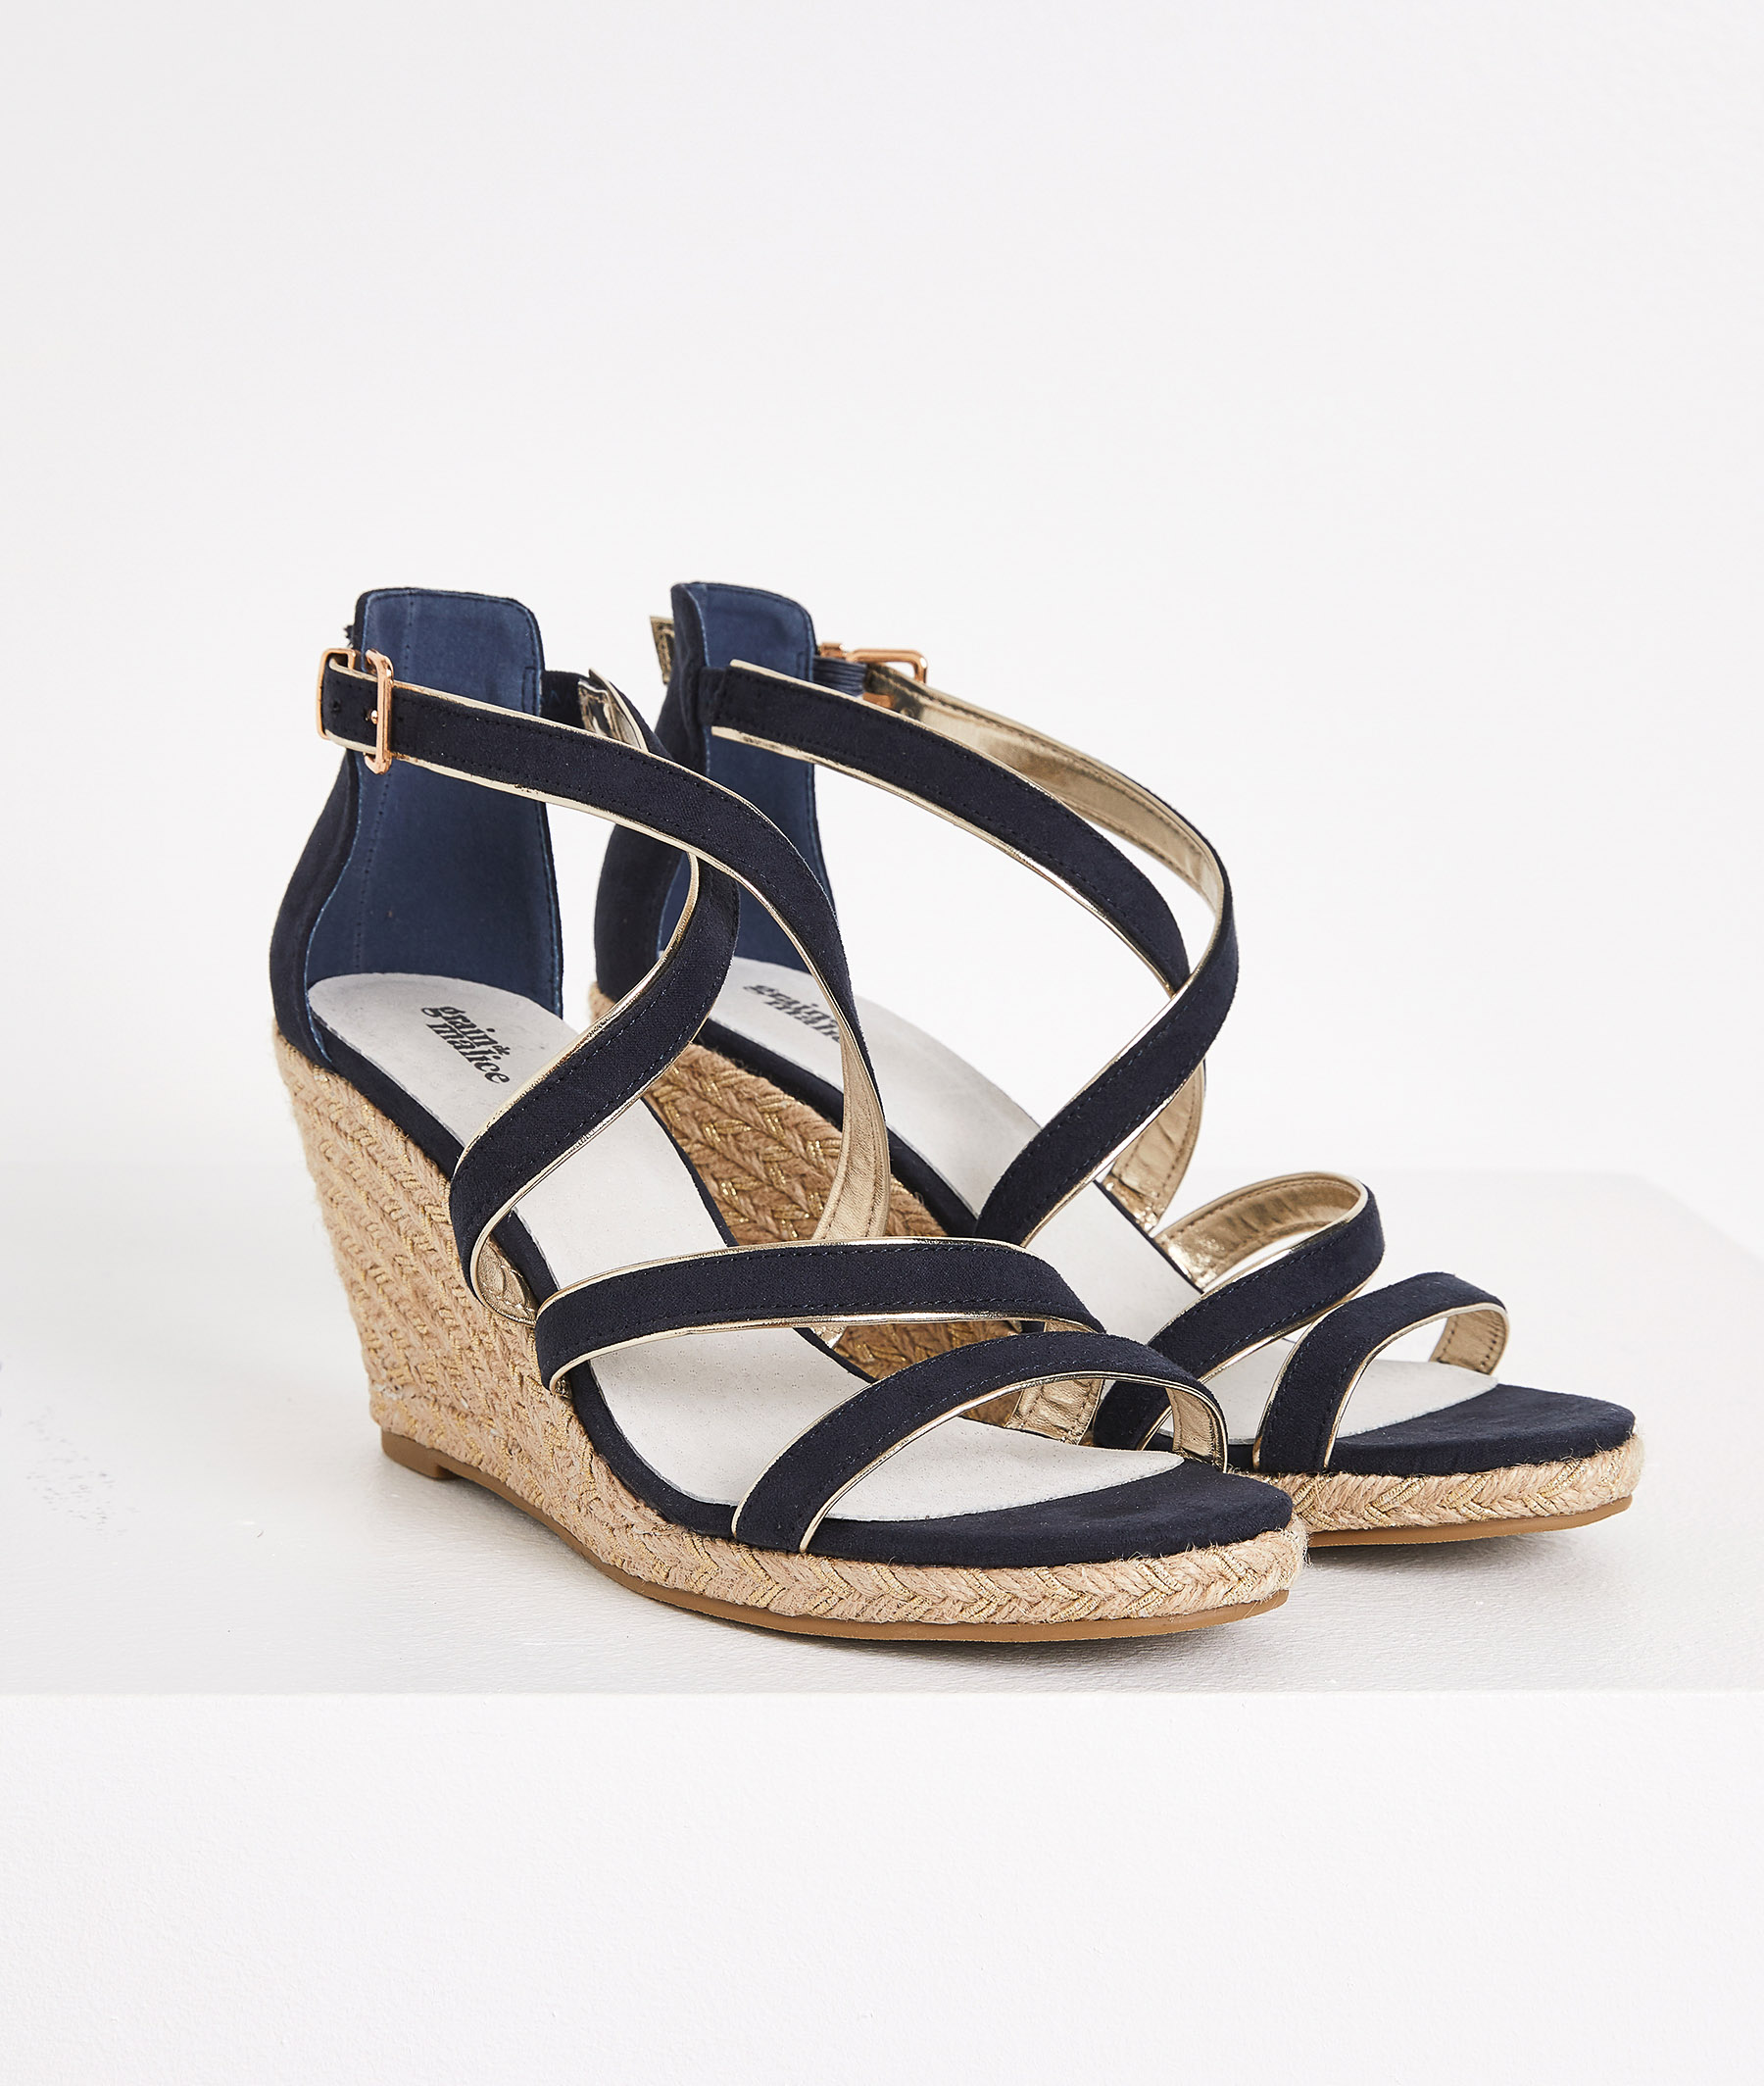 Sandales compensées marine femme MARINE